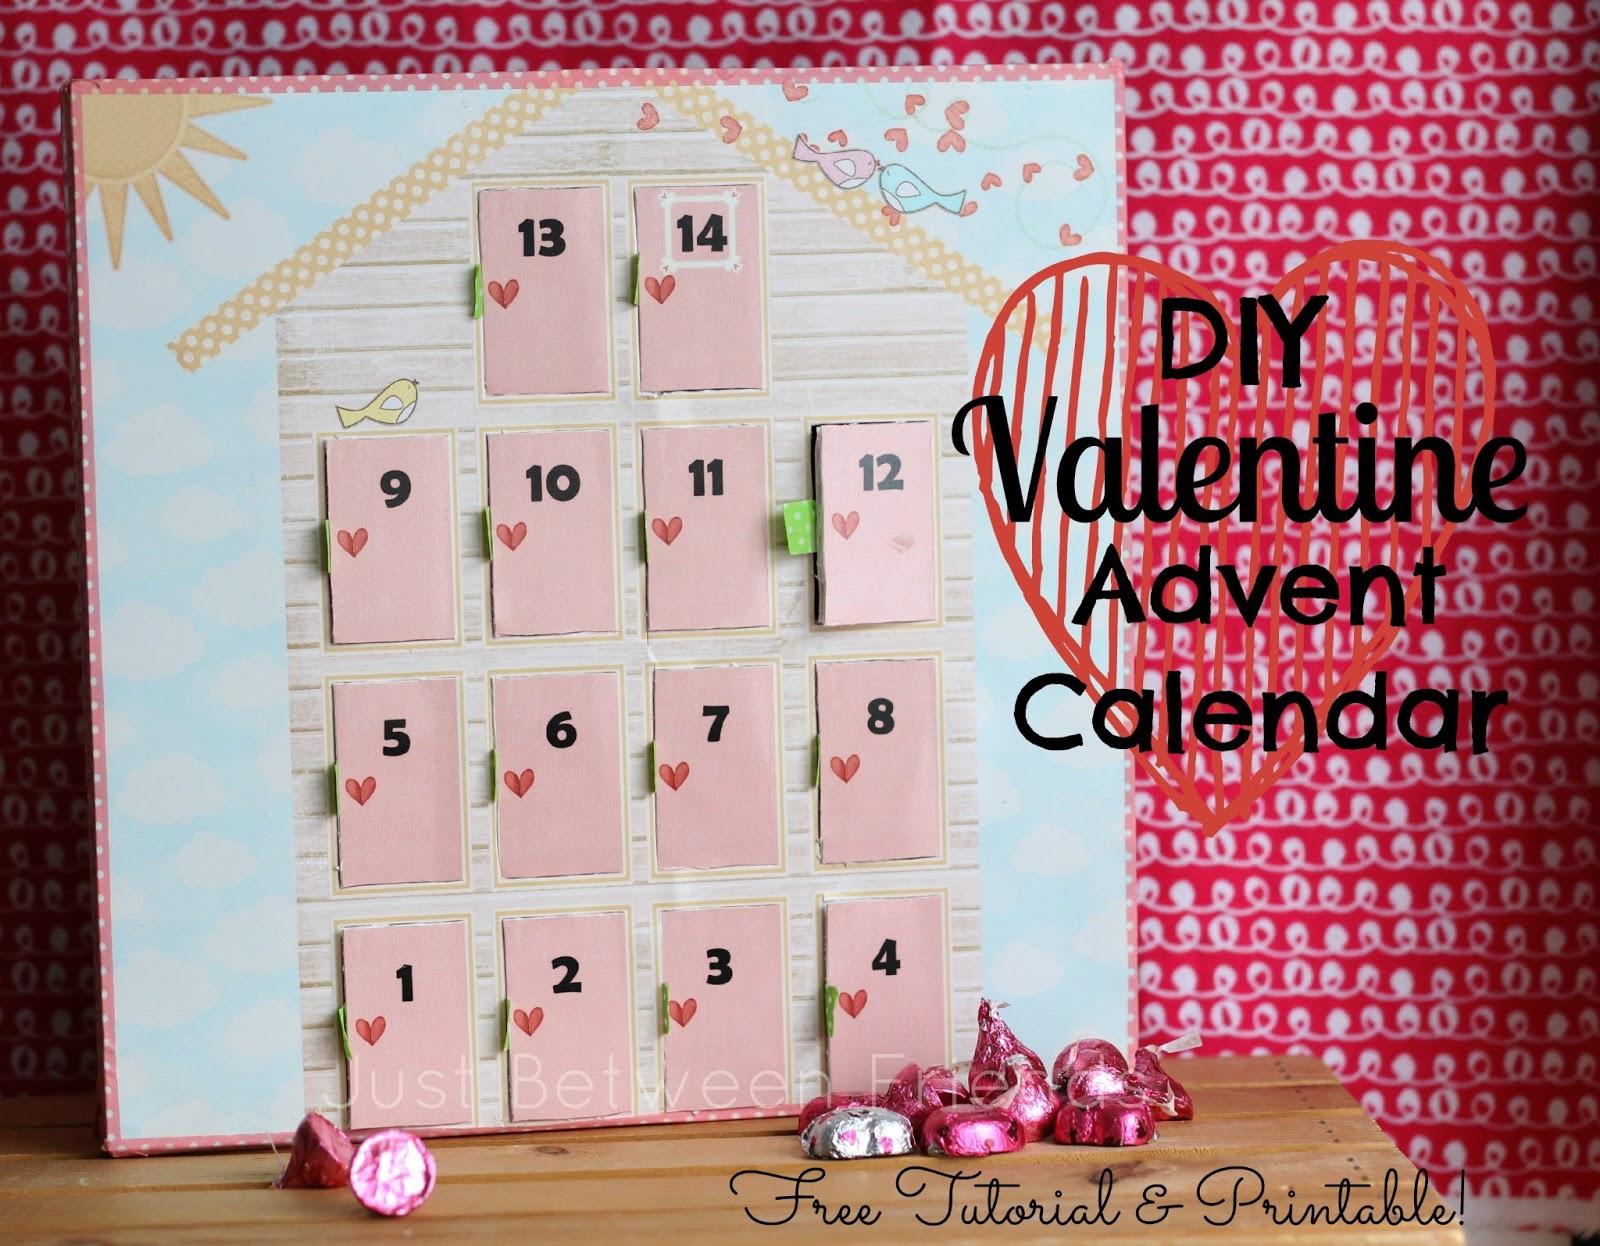 Diy Advent Calendar : Diy valentines advent calendar just between friends